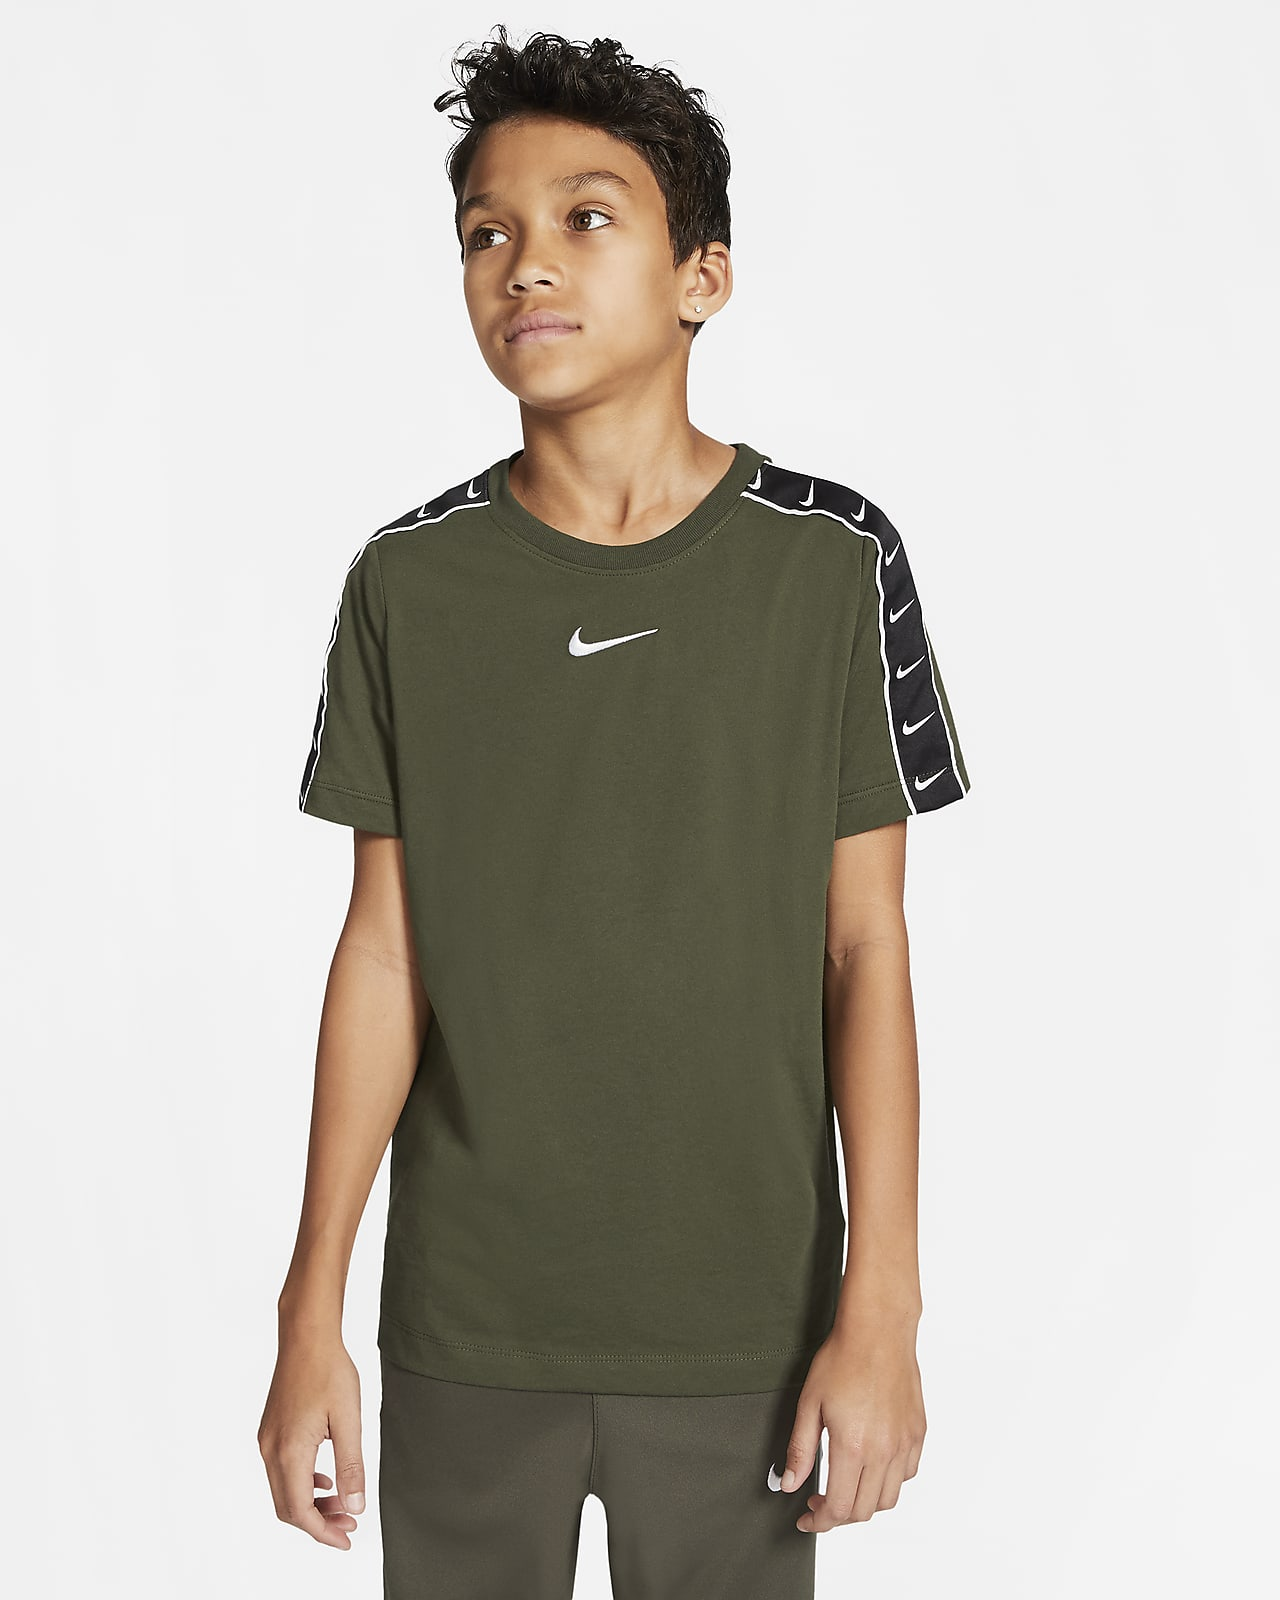 T-shirt Nike Sportswear Swoosh för ungdom